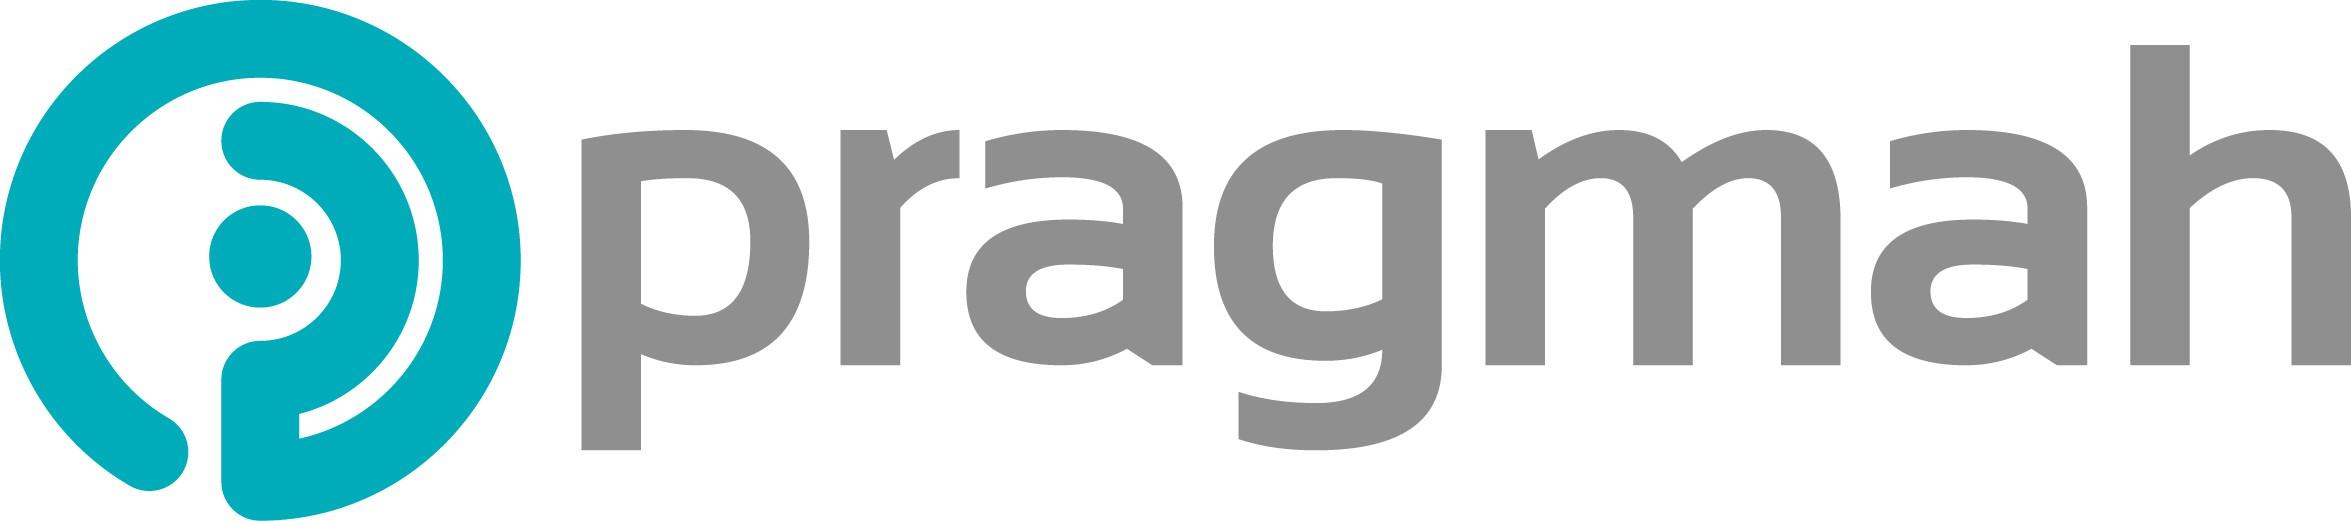 Create a professional logo for Pragmah